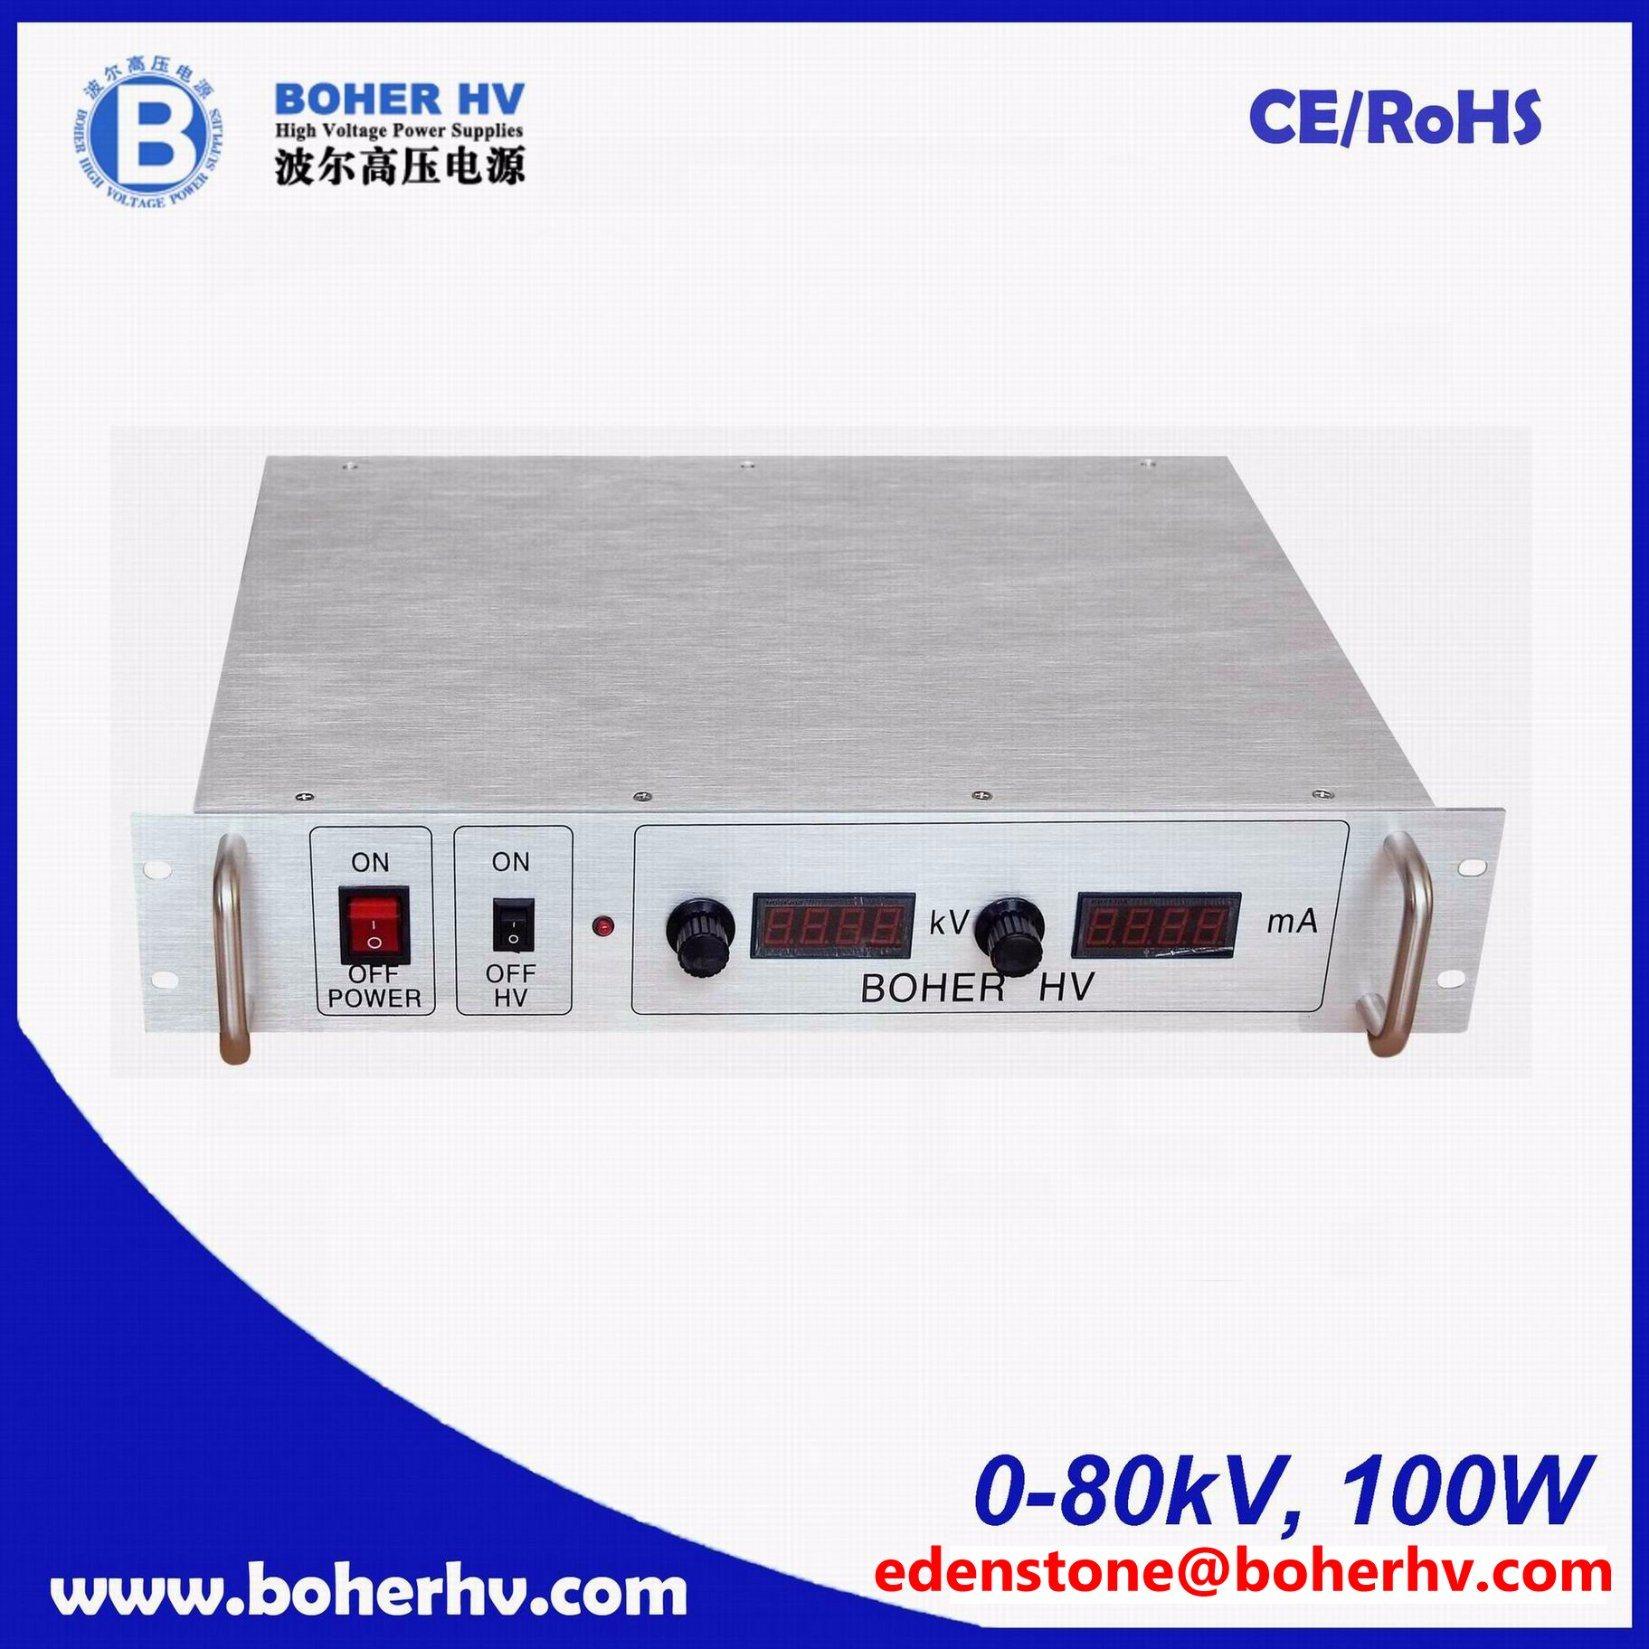 Rack power supply for general purpose 100W 80kV LAS-230VAC-P100-80K-2U